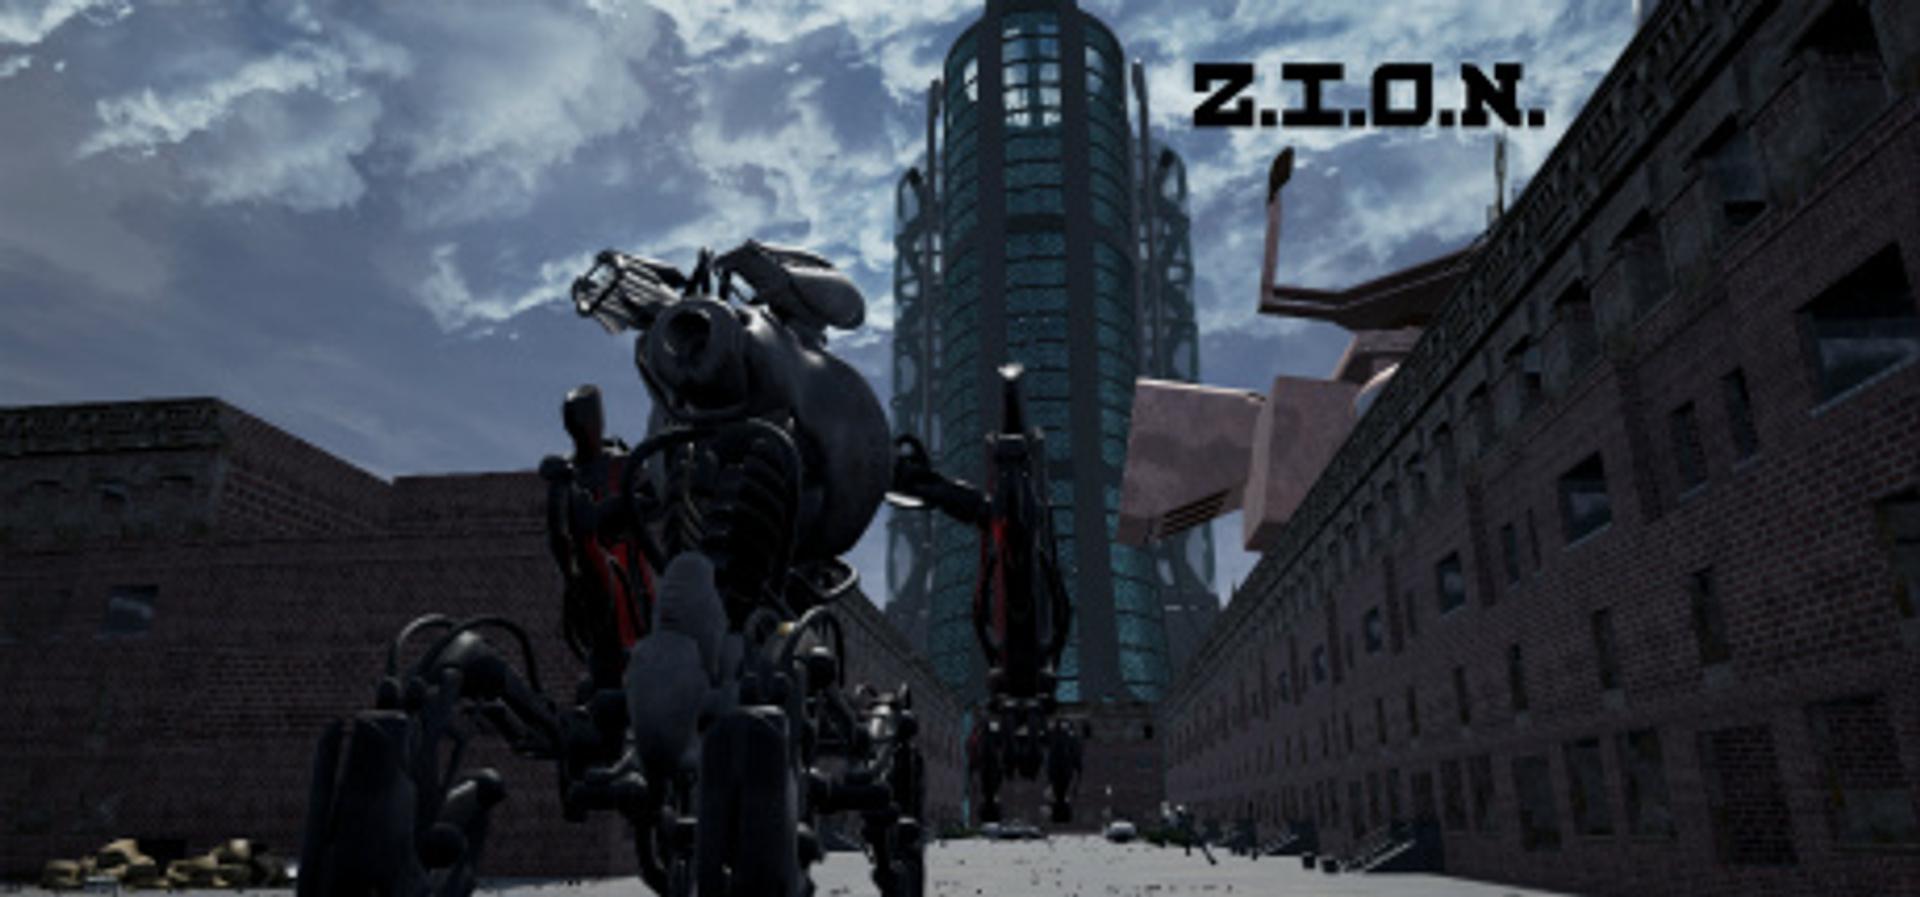 buy Z.I.O.N. cd key for all platform